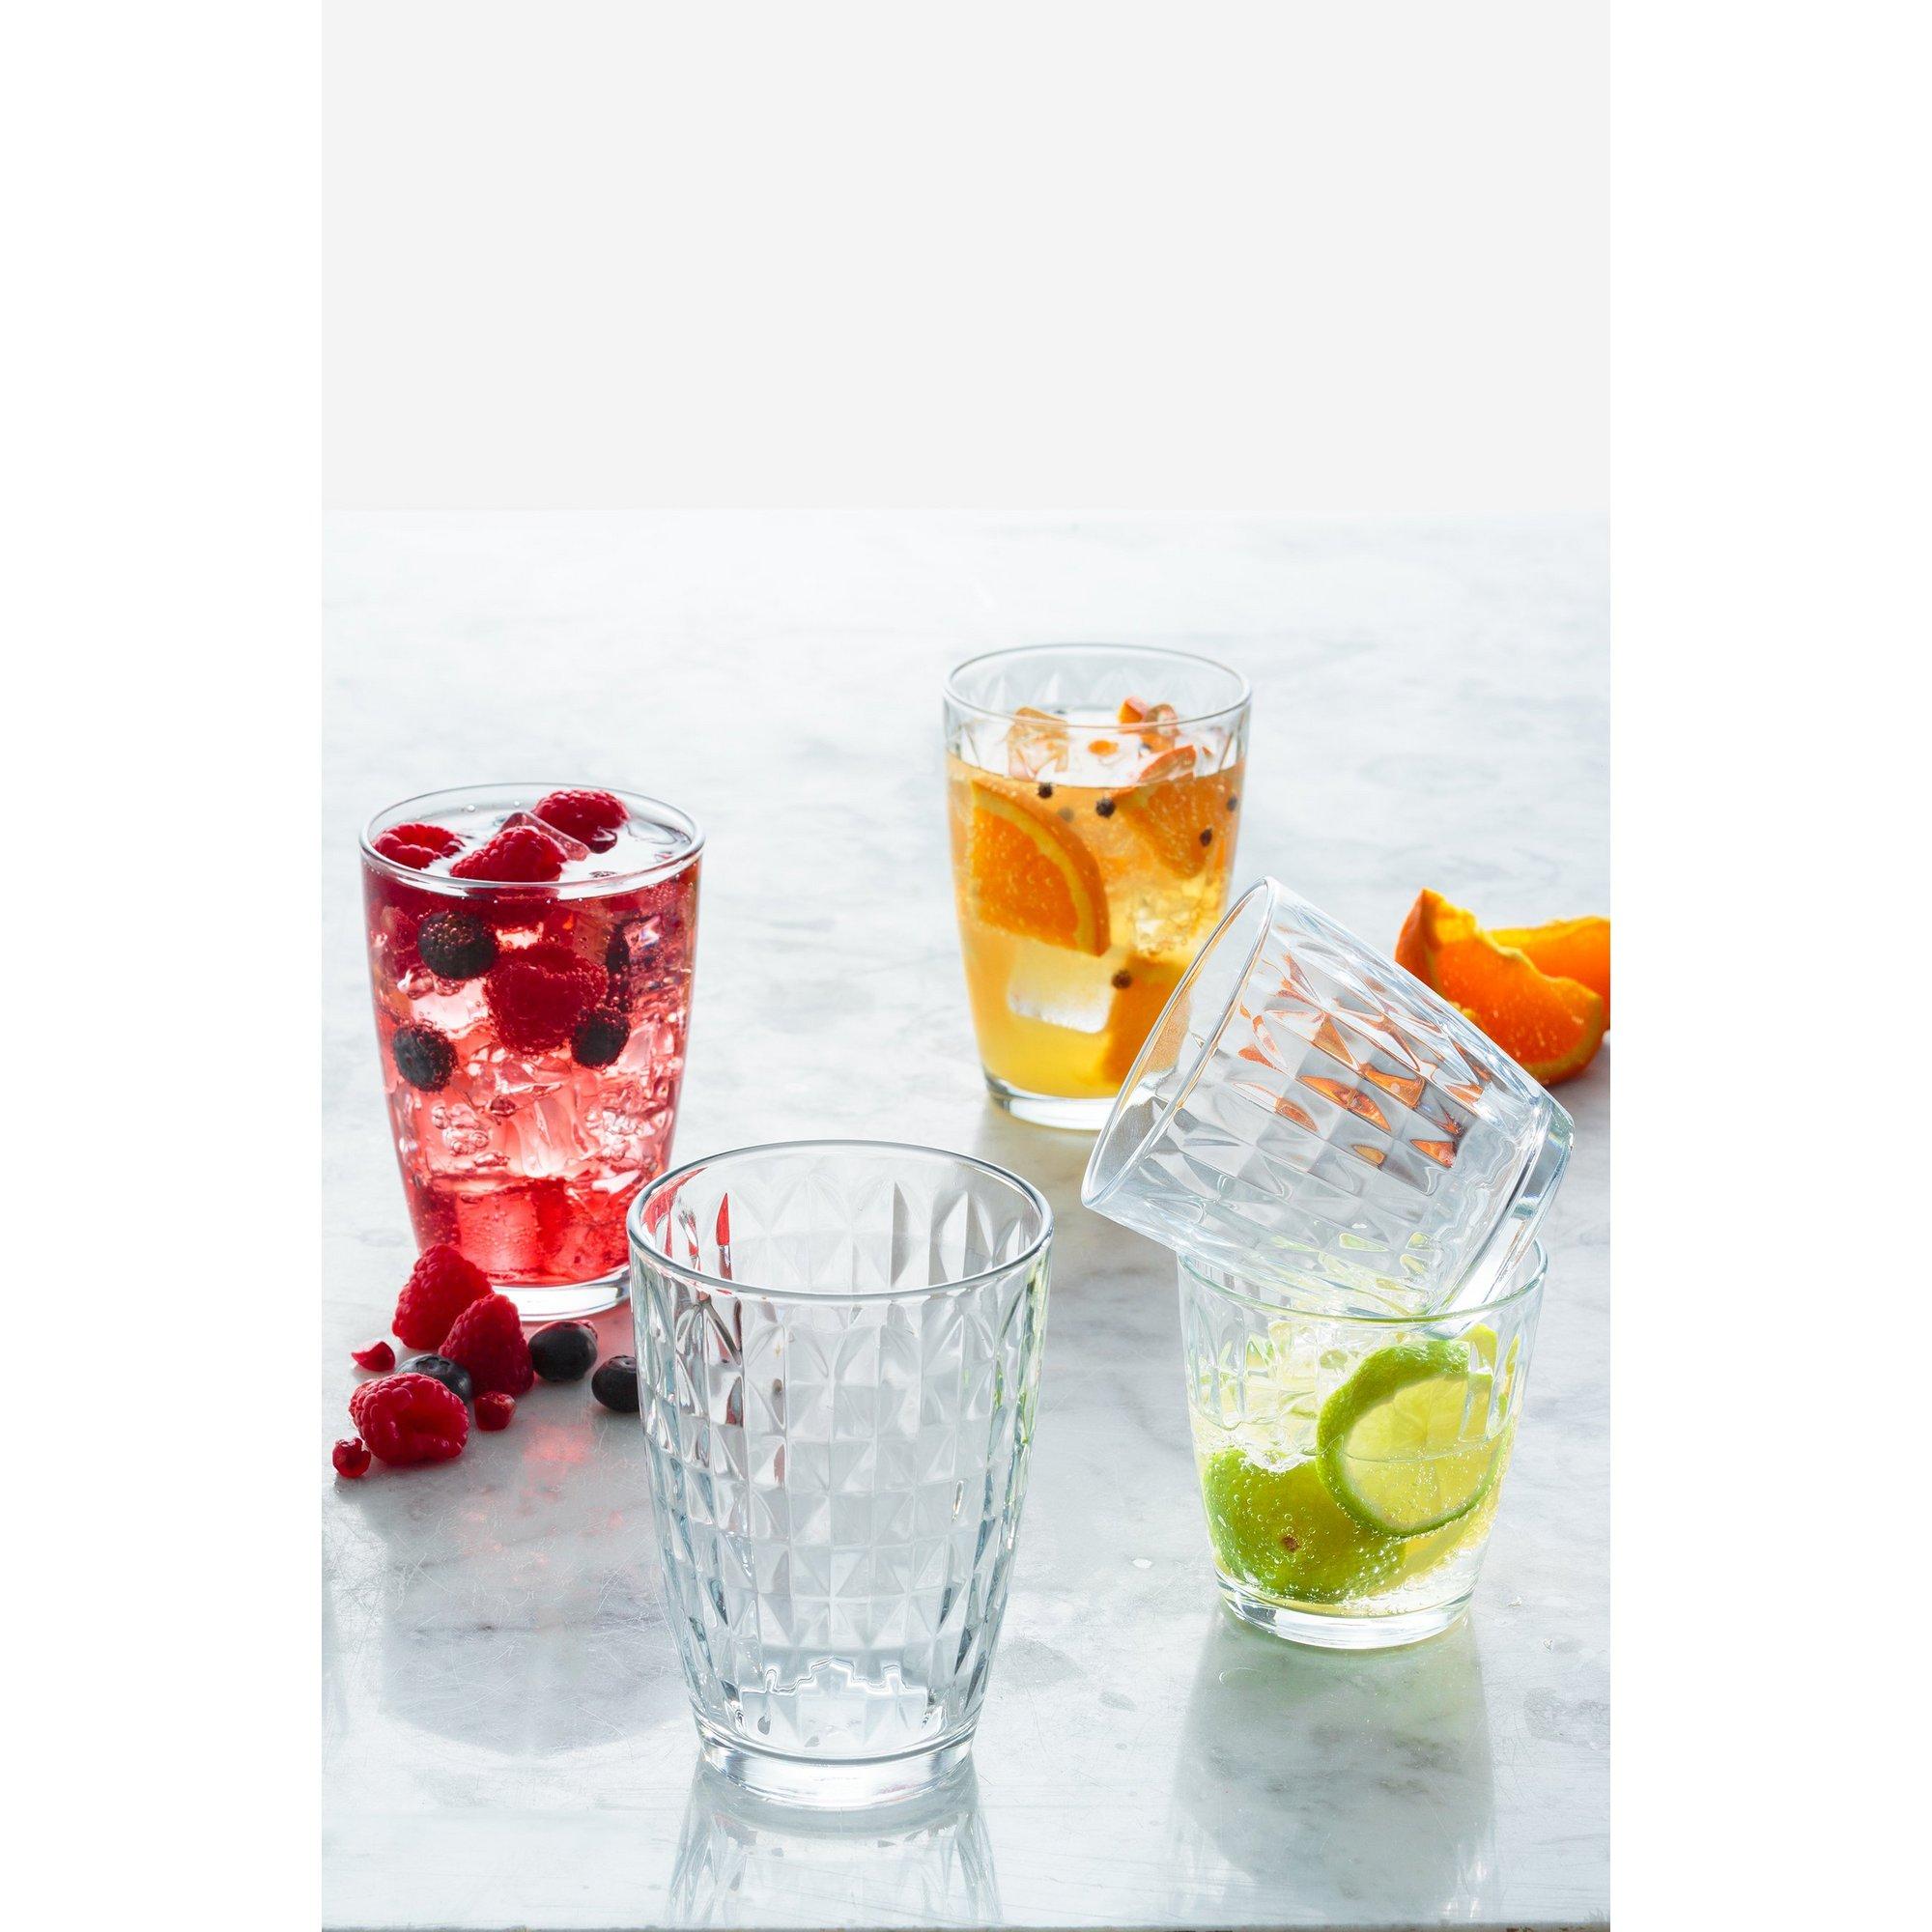 Image of 12 Piece Ravenhead Essentials Jewel Glasses Set